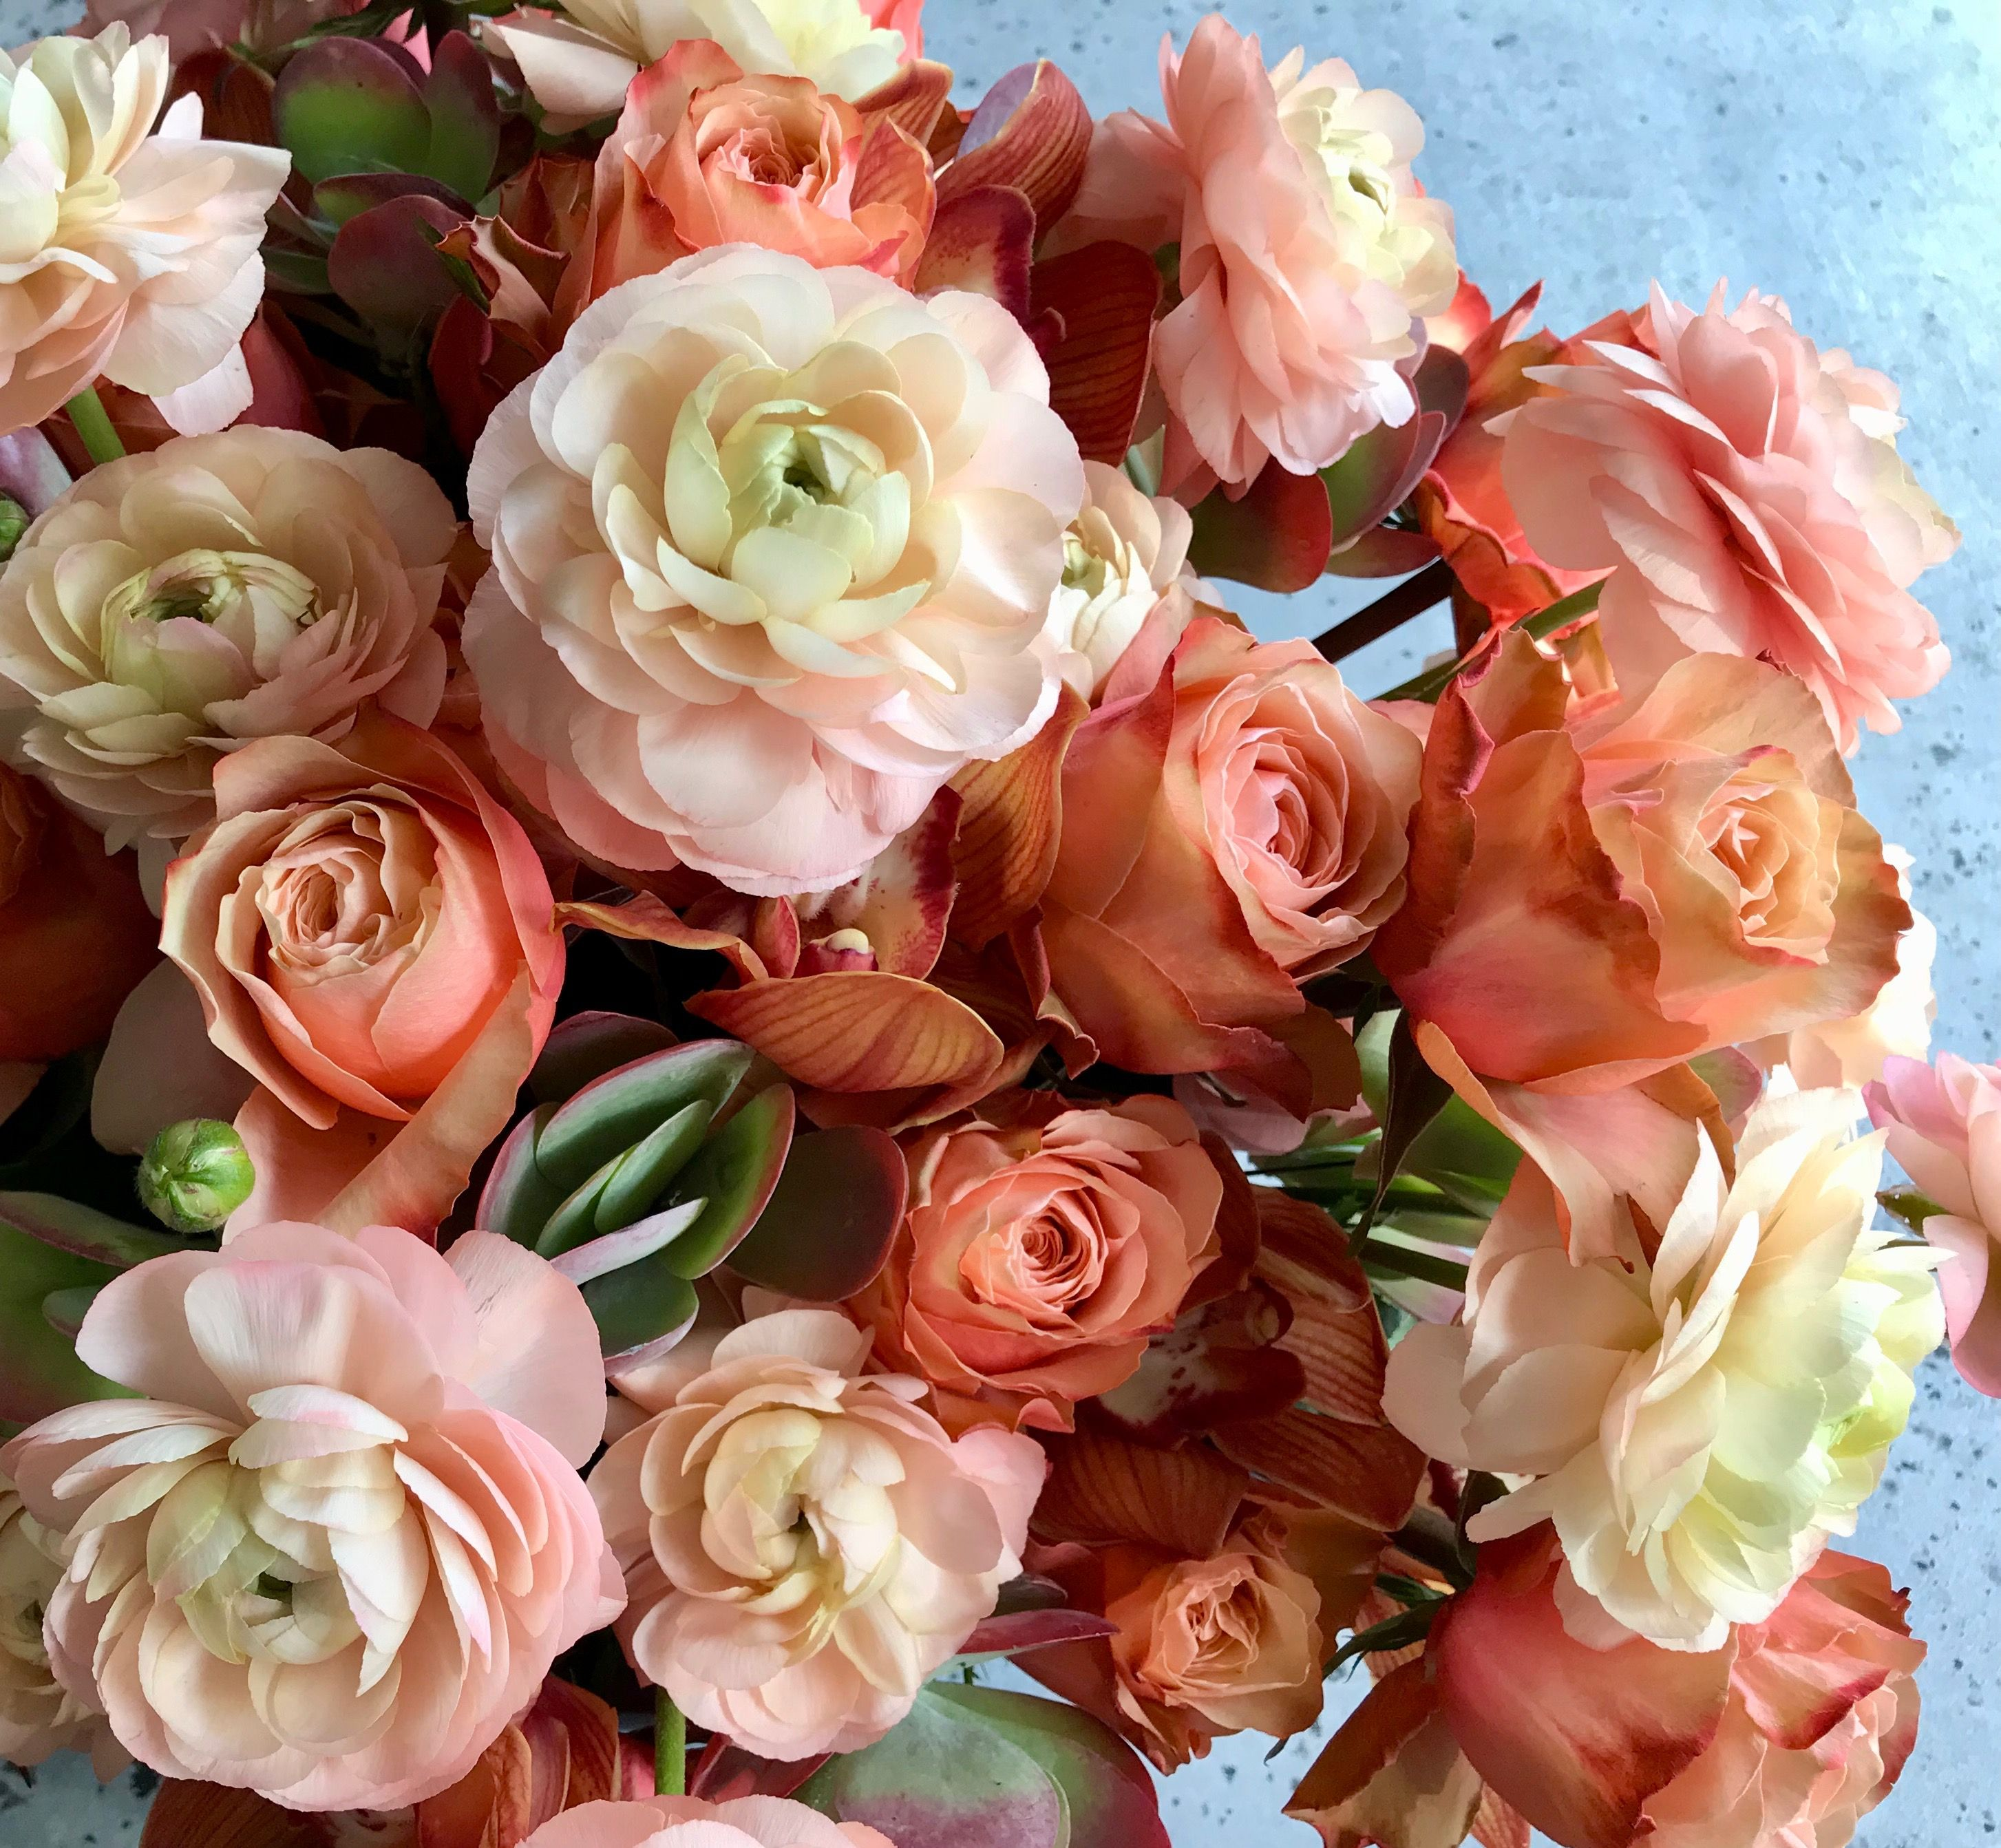 Peach and Terracotta Color Flowers | Donaldo Radovich Designs ...